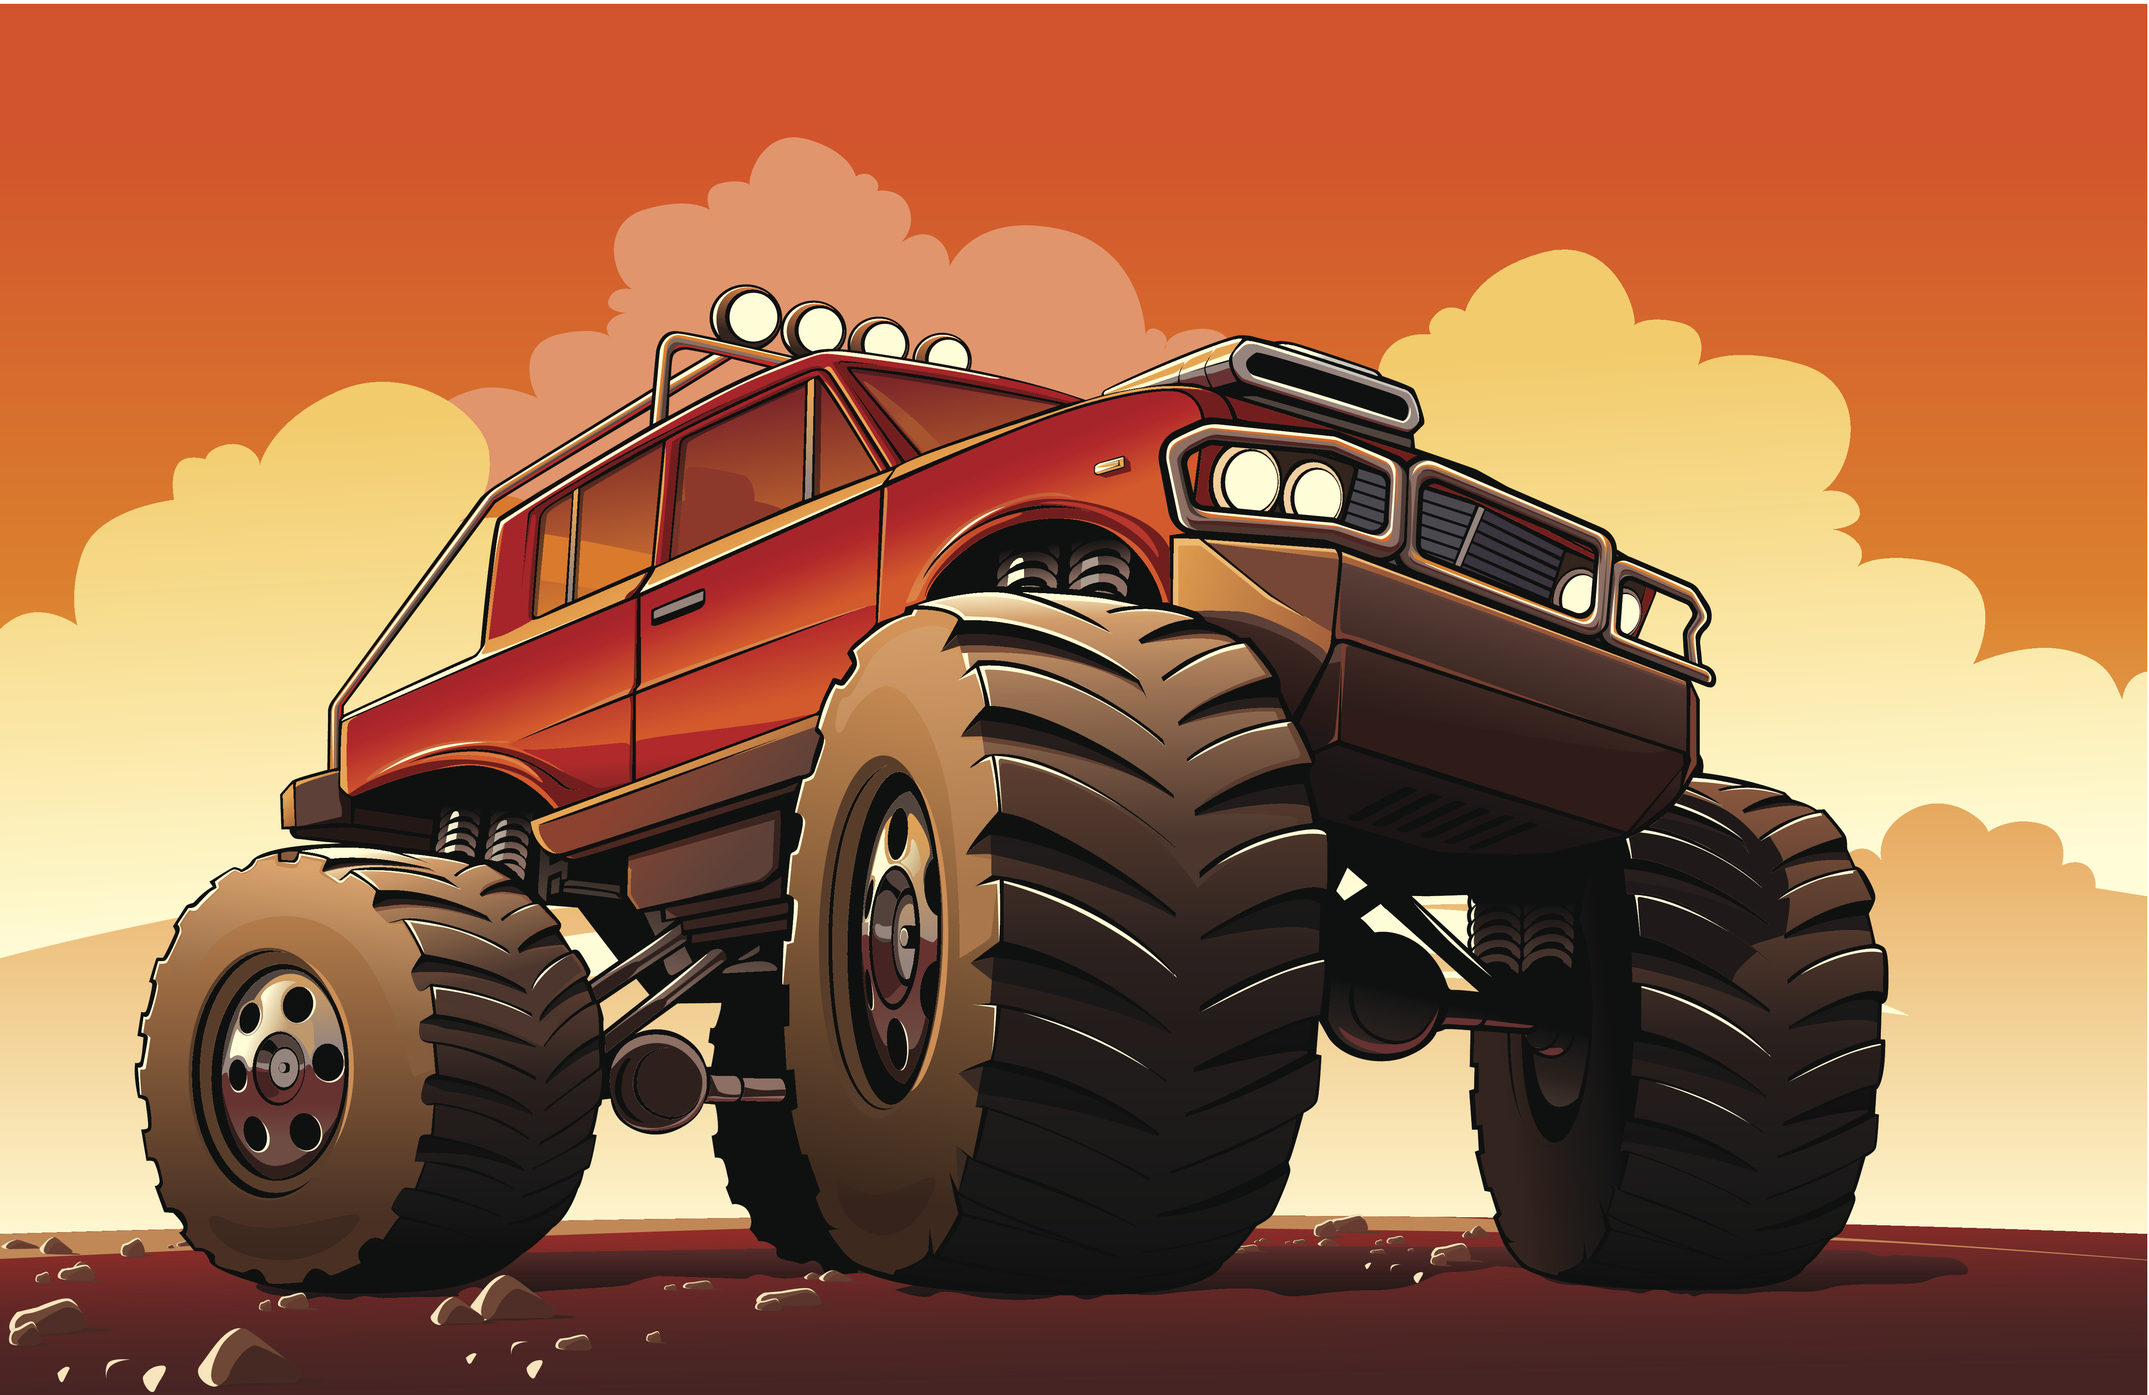 Geschichte der Monster-Trucks